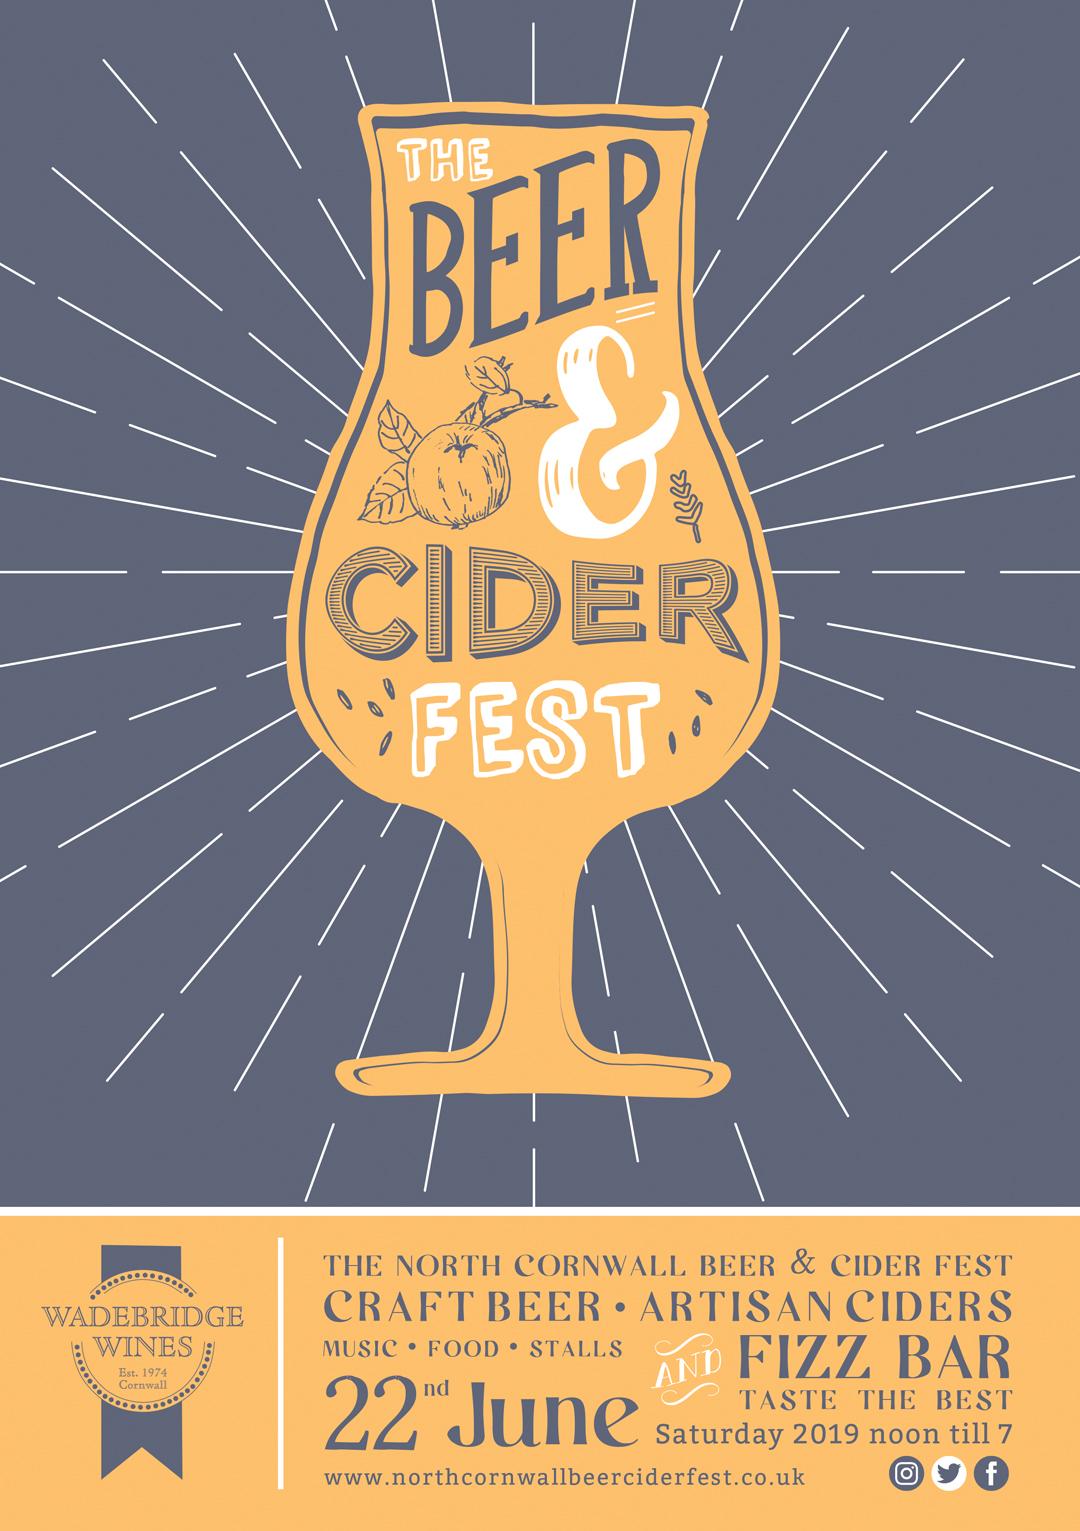 Poster design for the Wadebridge Wines Beer and Cider festival